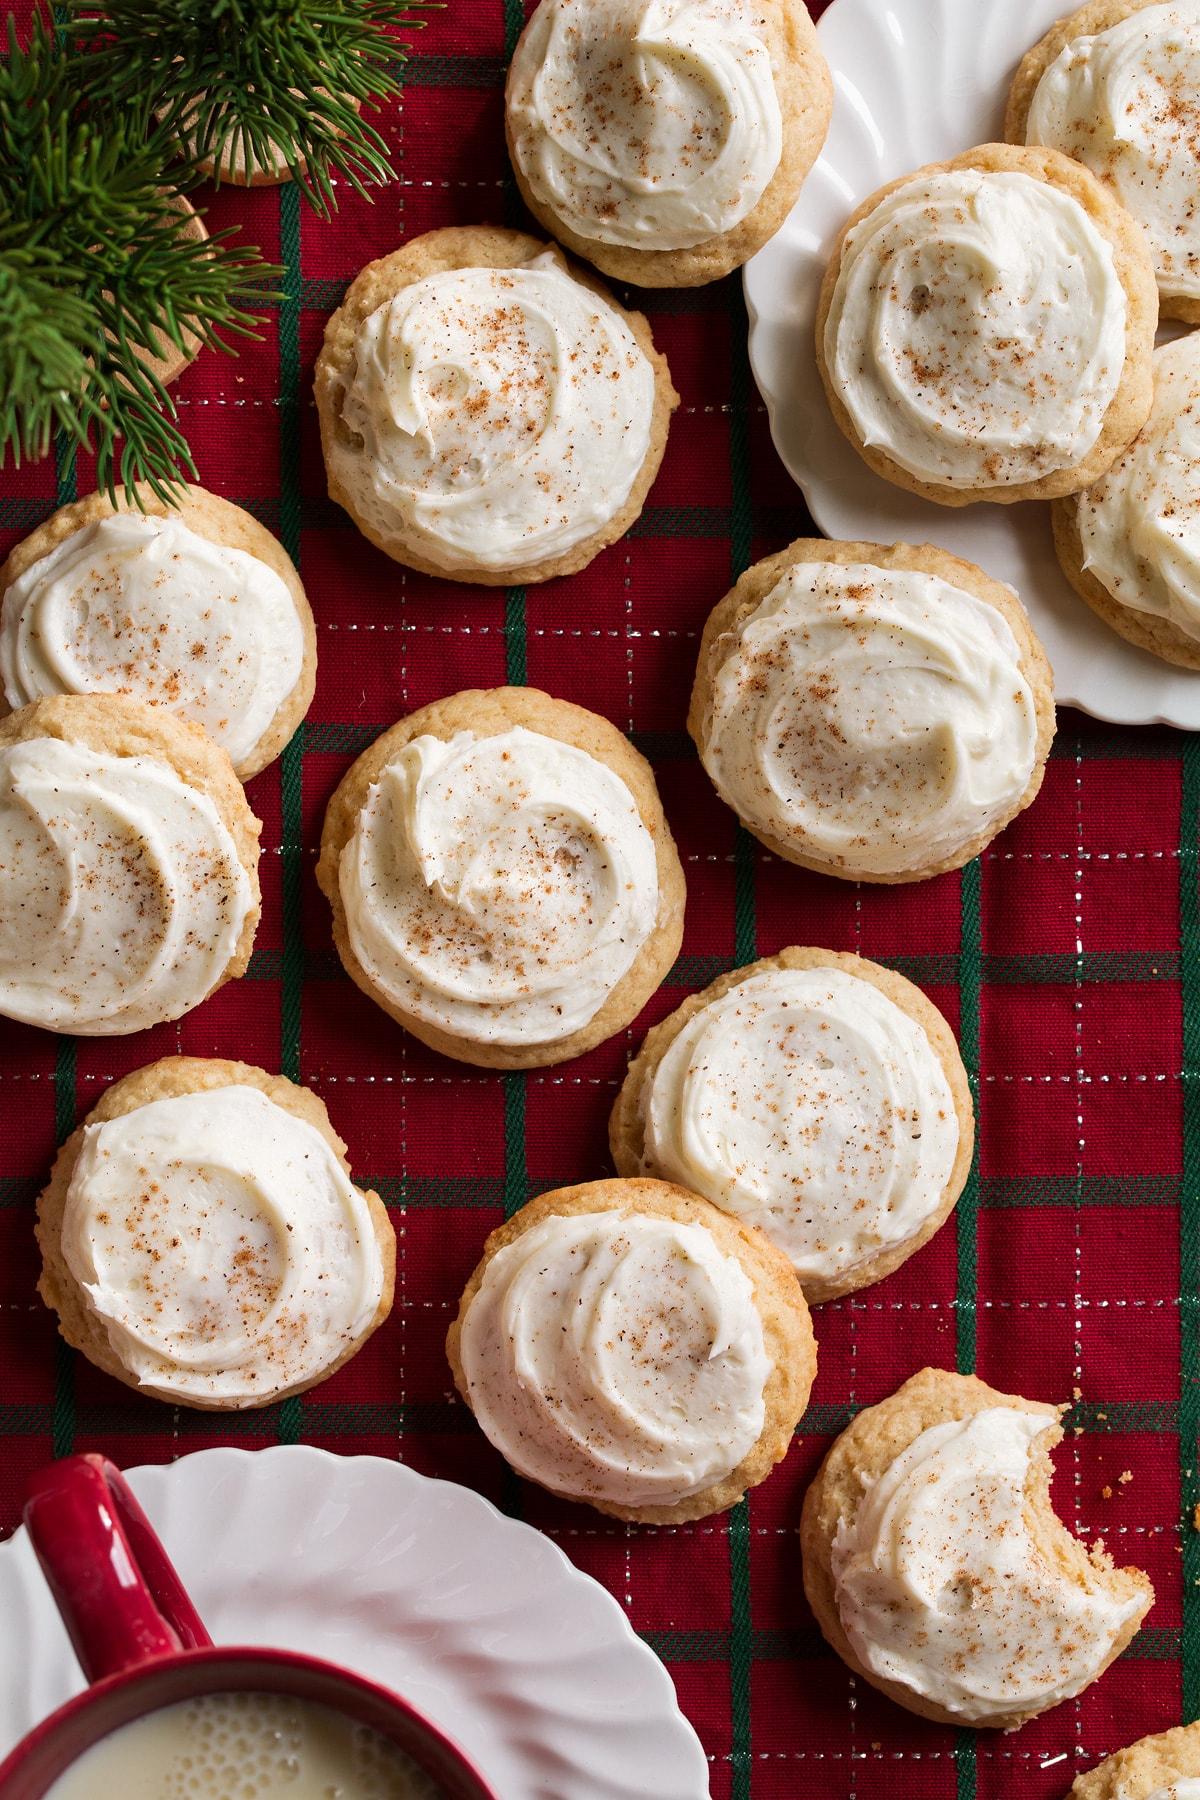 Eggnog Cookies sitting on a Christmas plaid tablecloth.